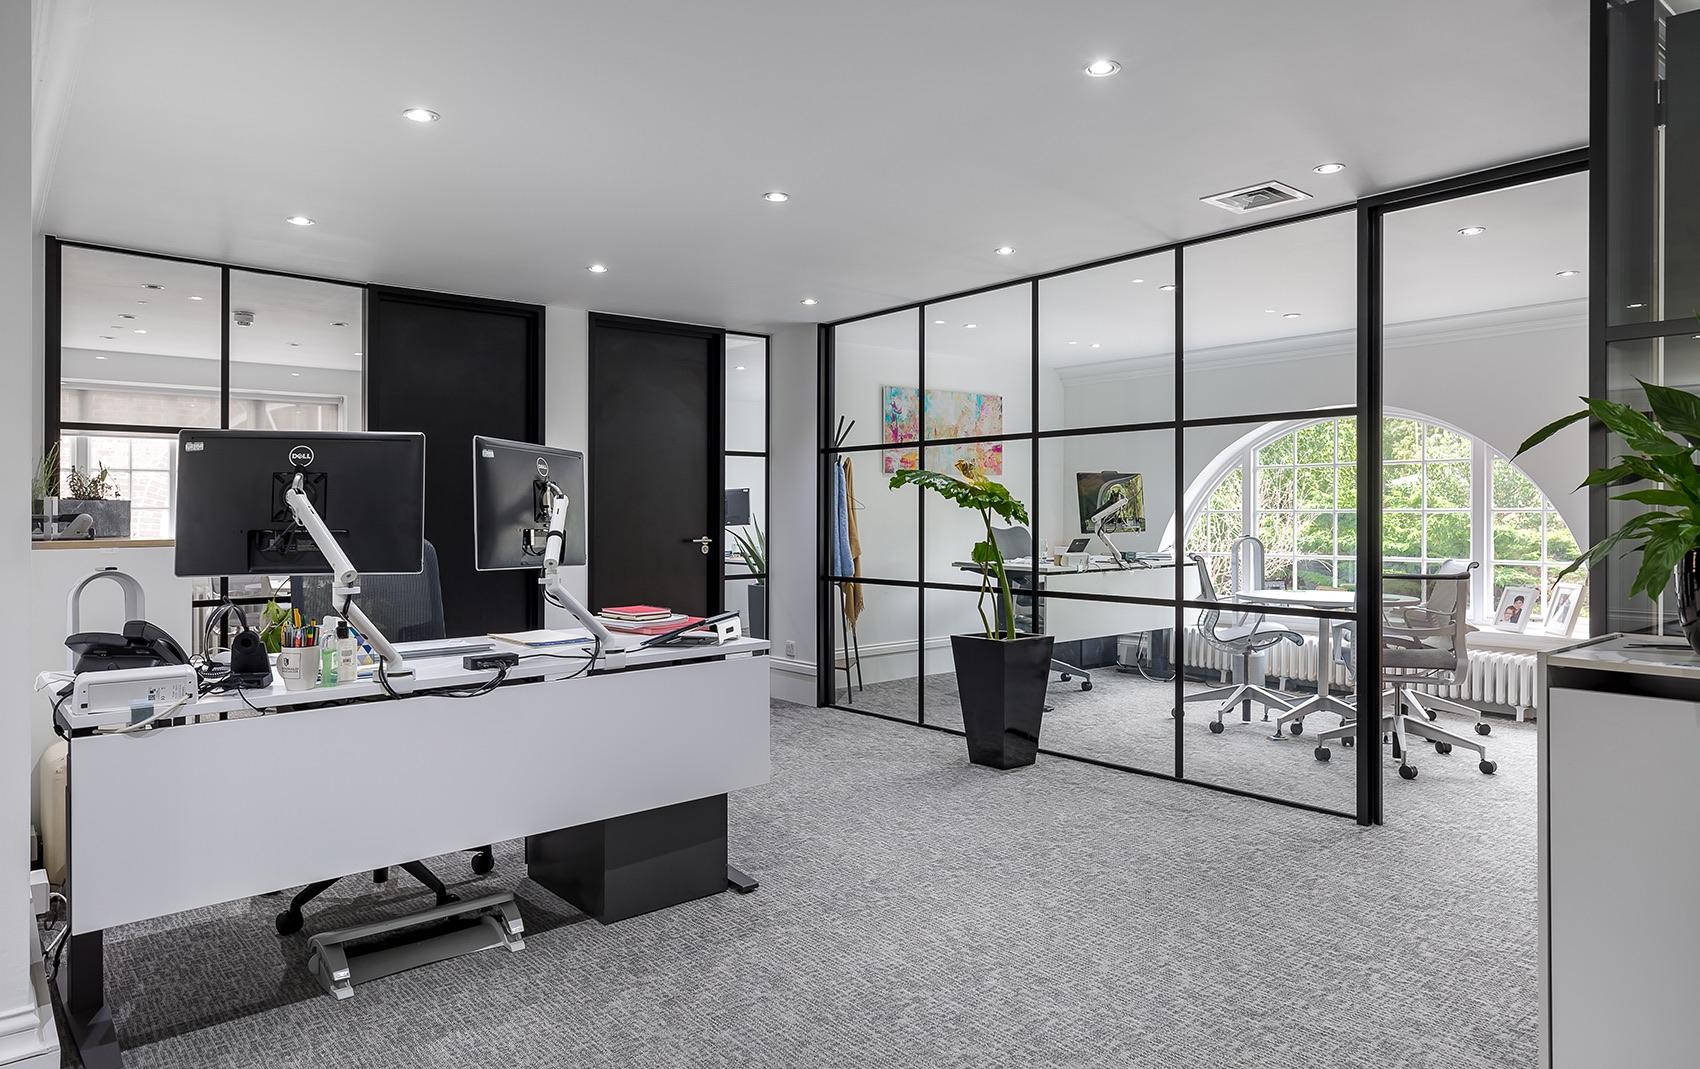 halma-amersham-office-28